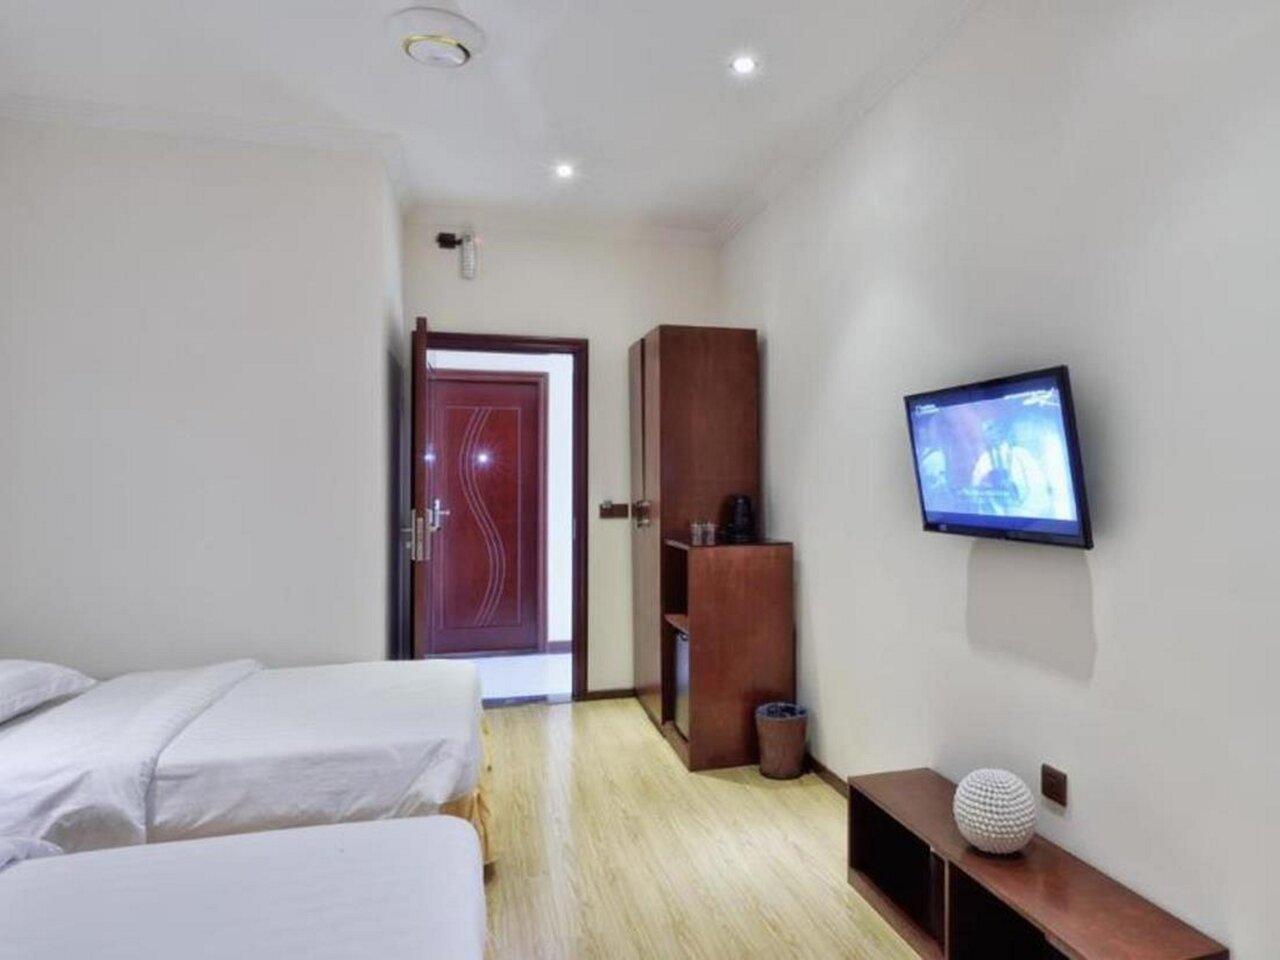 Whiteshell Island Hotel & Spa